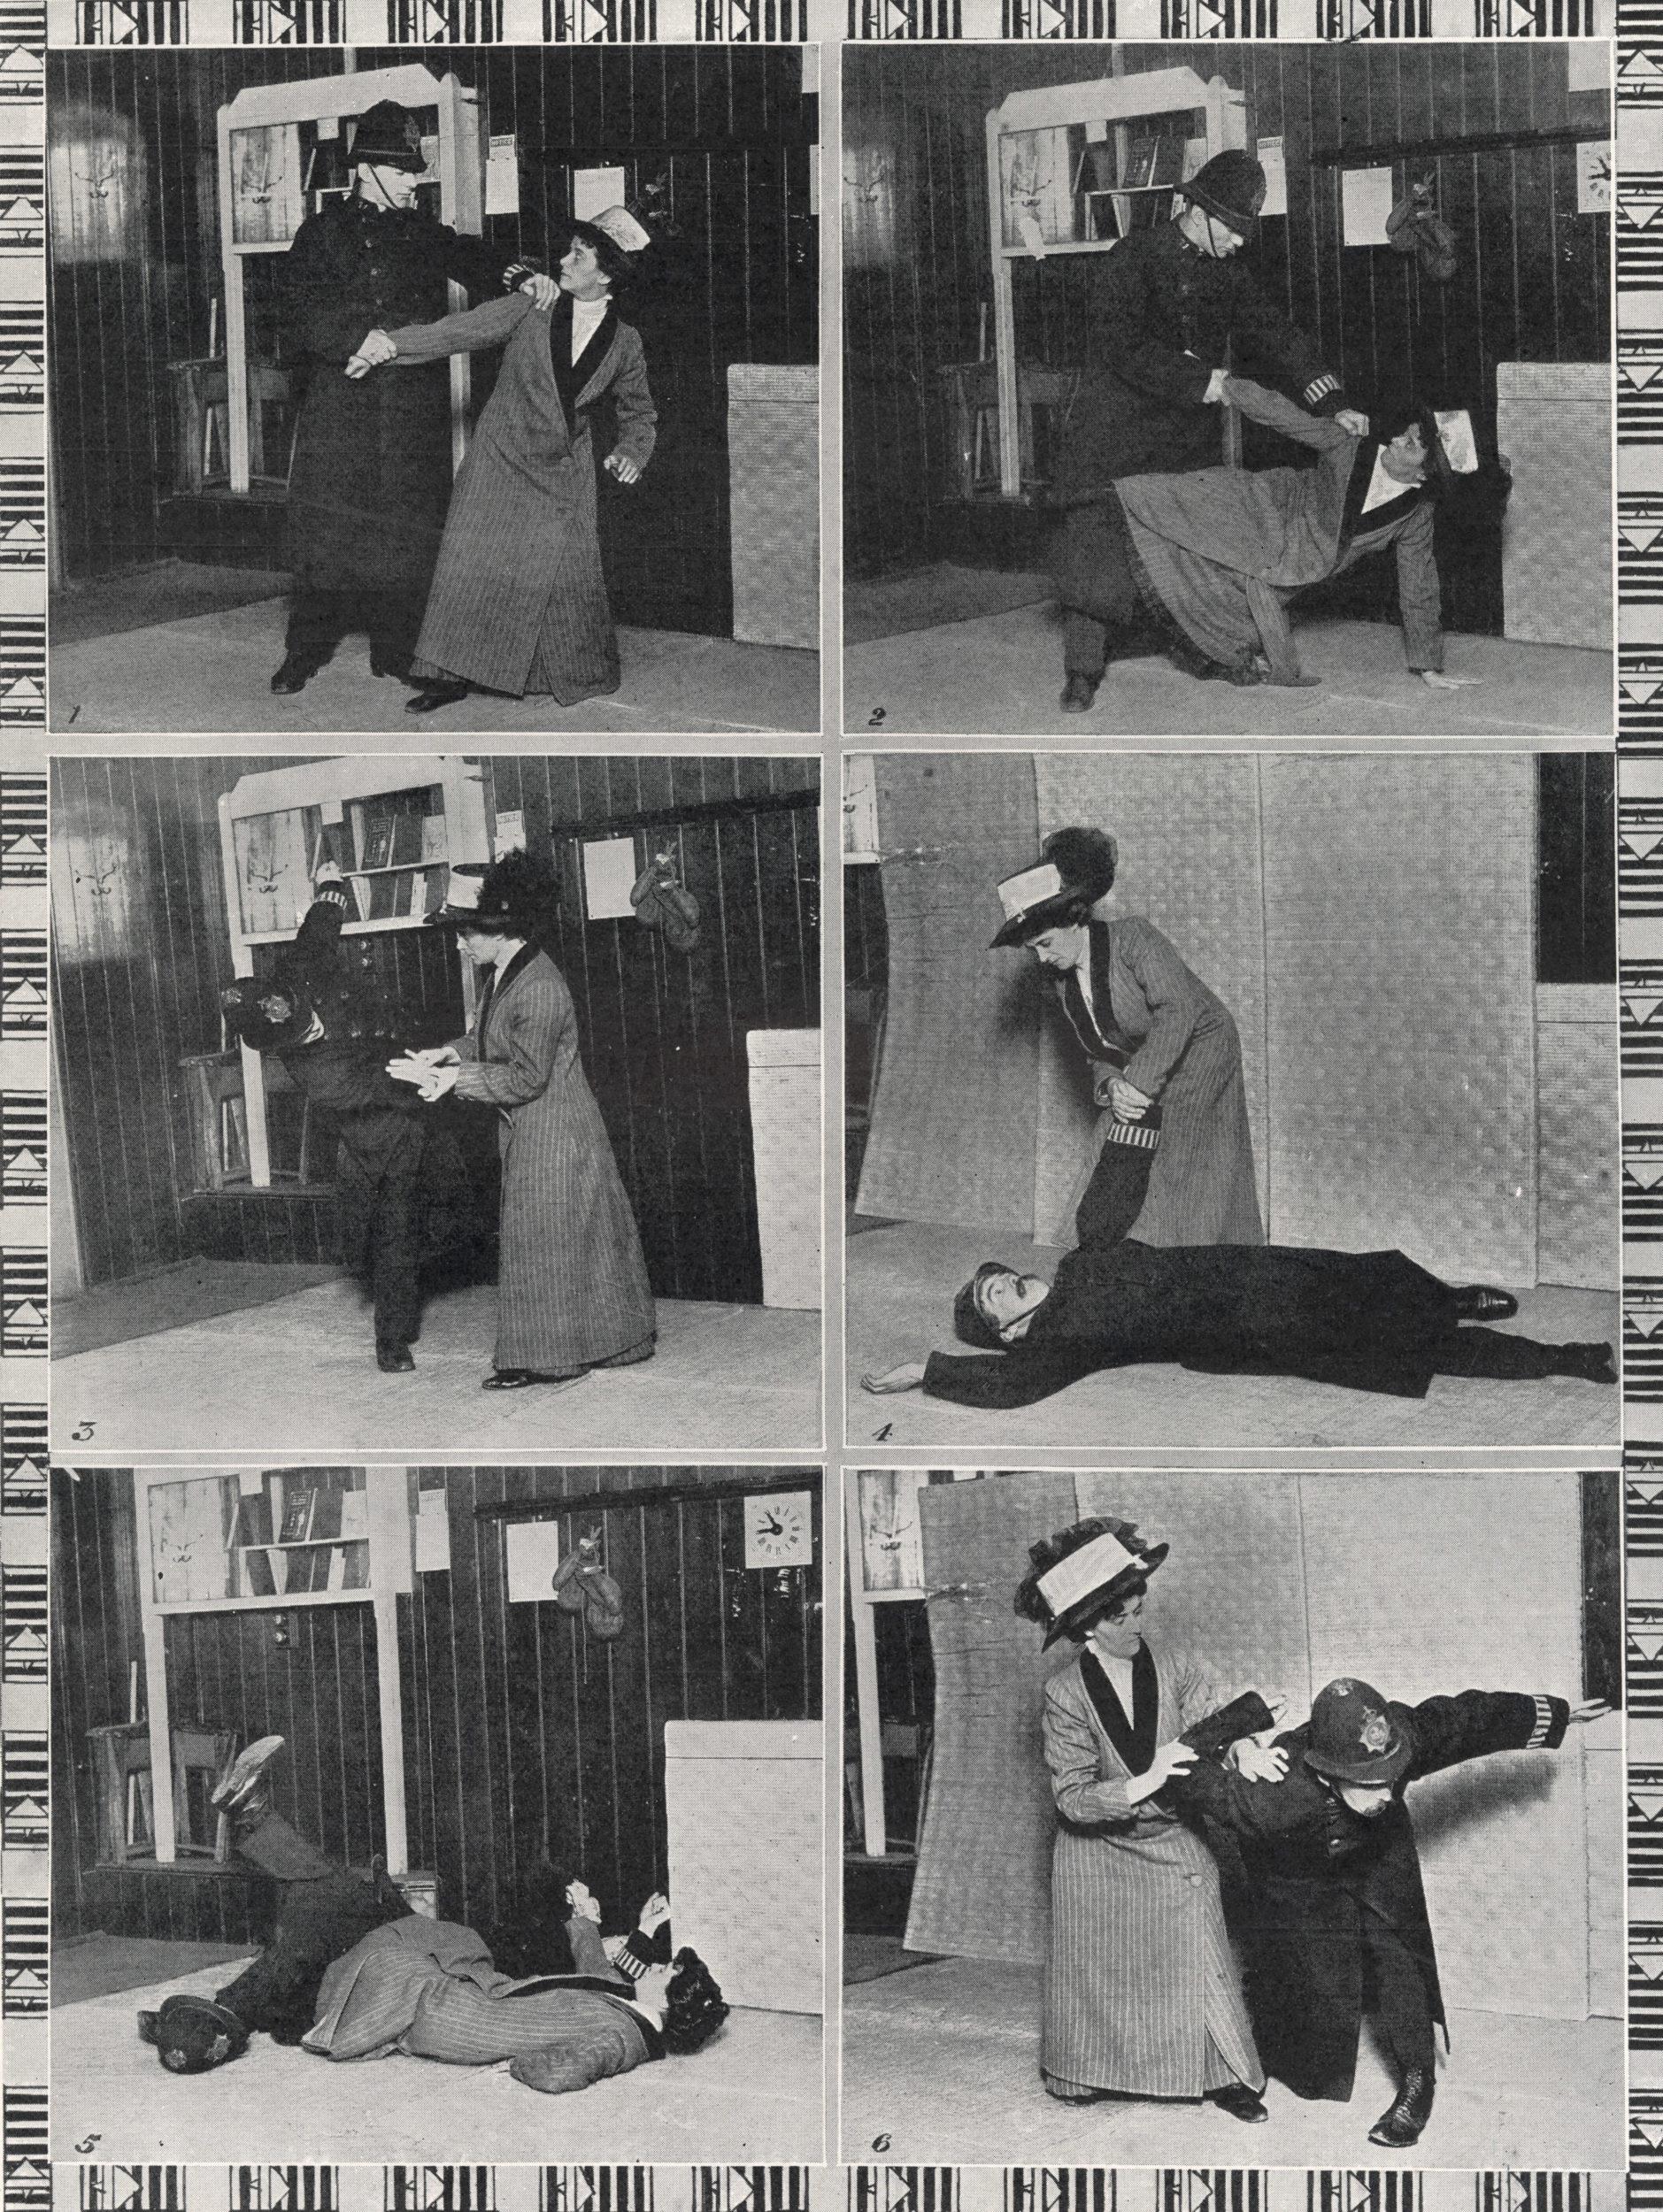 Six black and white photographs arranged in a grid on a contact sheet showing Edith Garrud using jiu jitsu to restrain a policeman